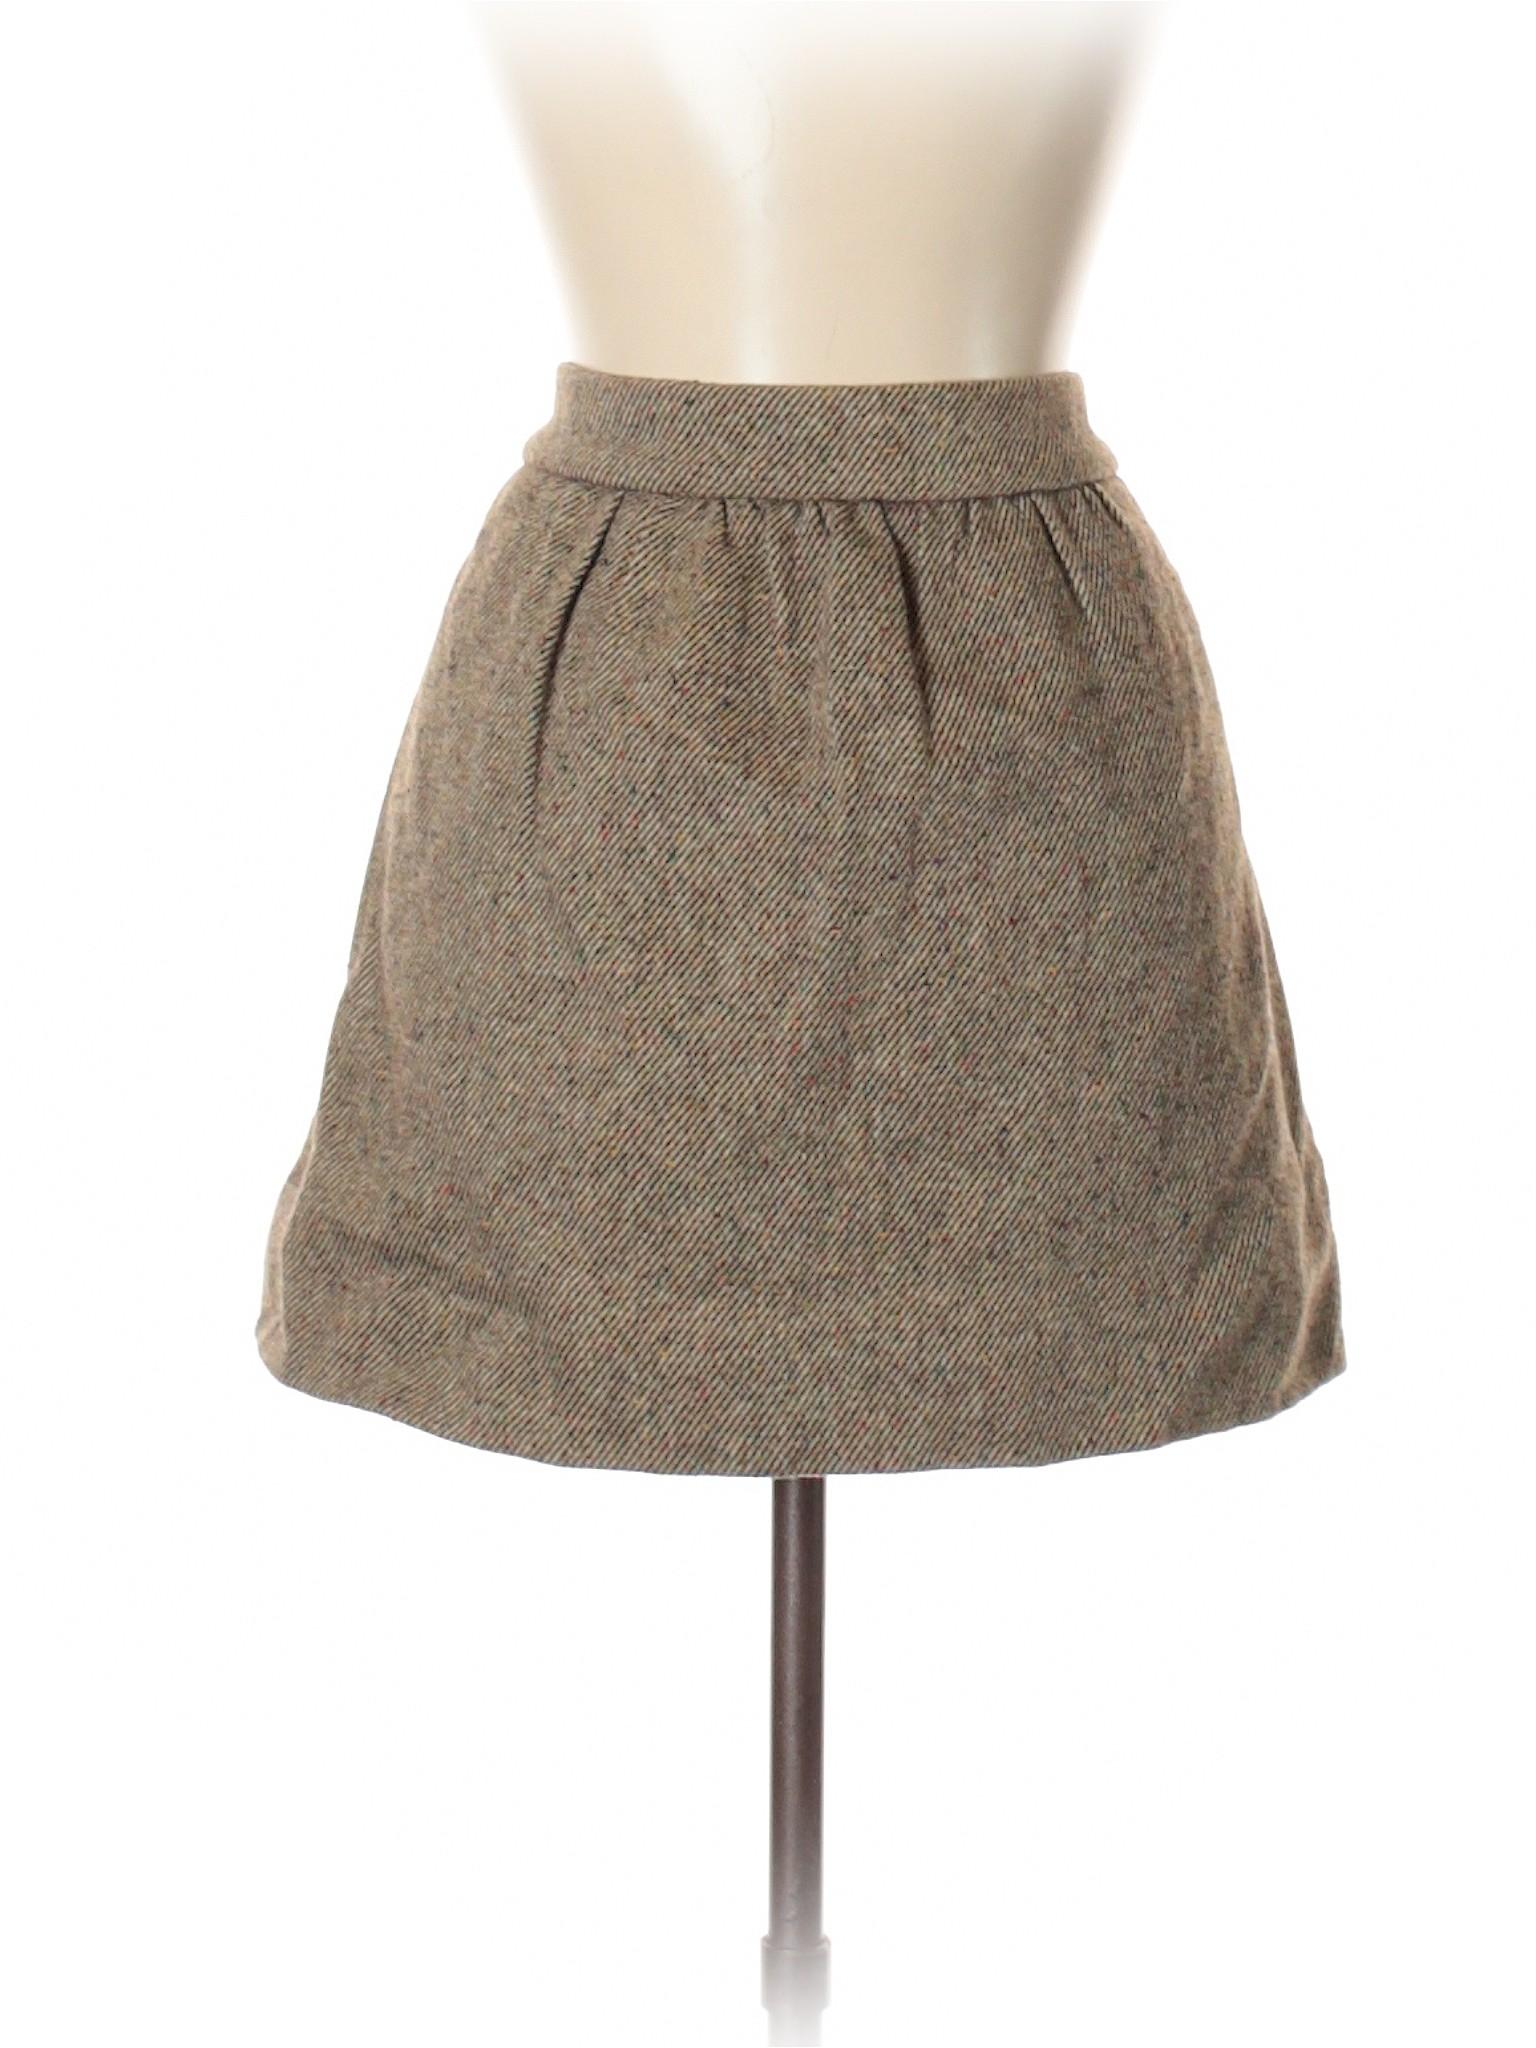 Skirt Boutique Wool Skirt Skirt Boutique Boutique Wool Boutique Wool Wool AqA4z